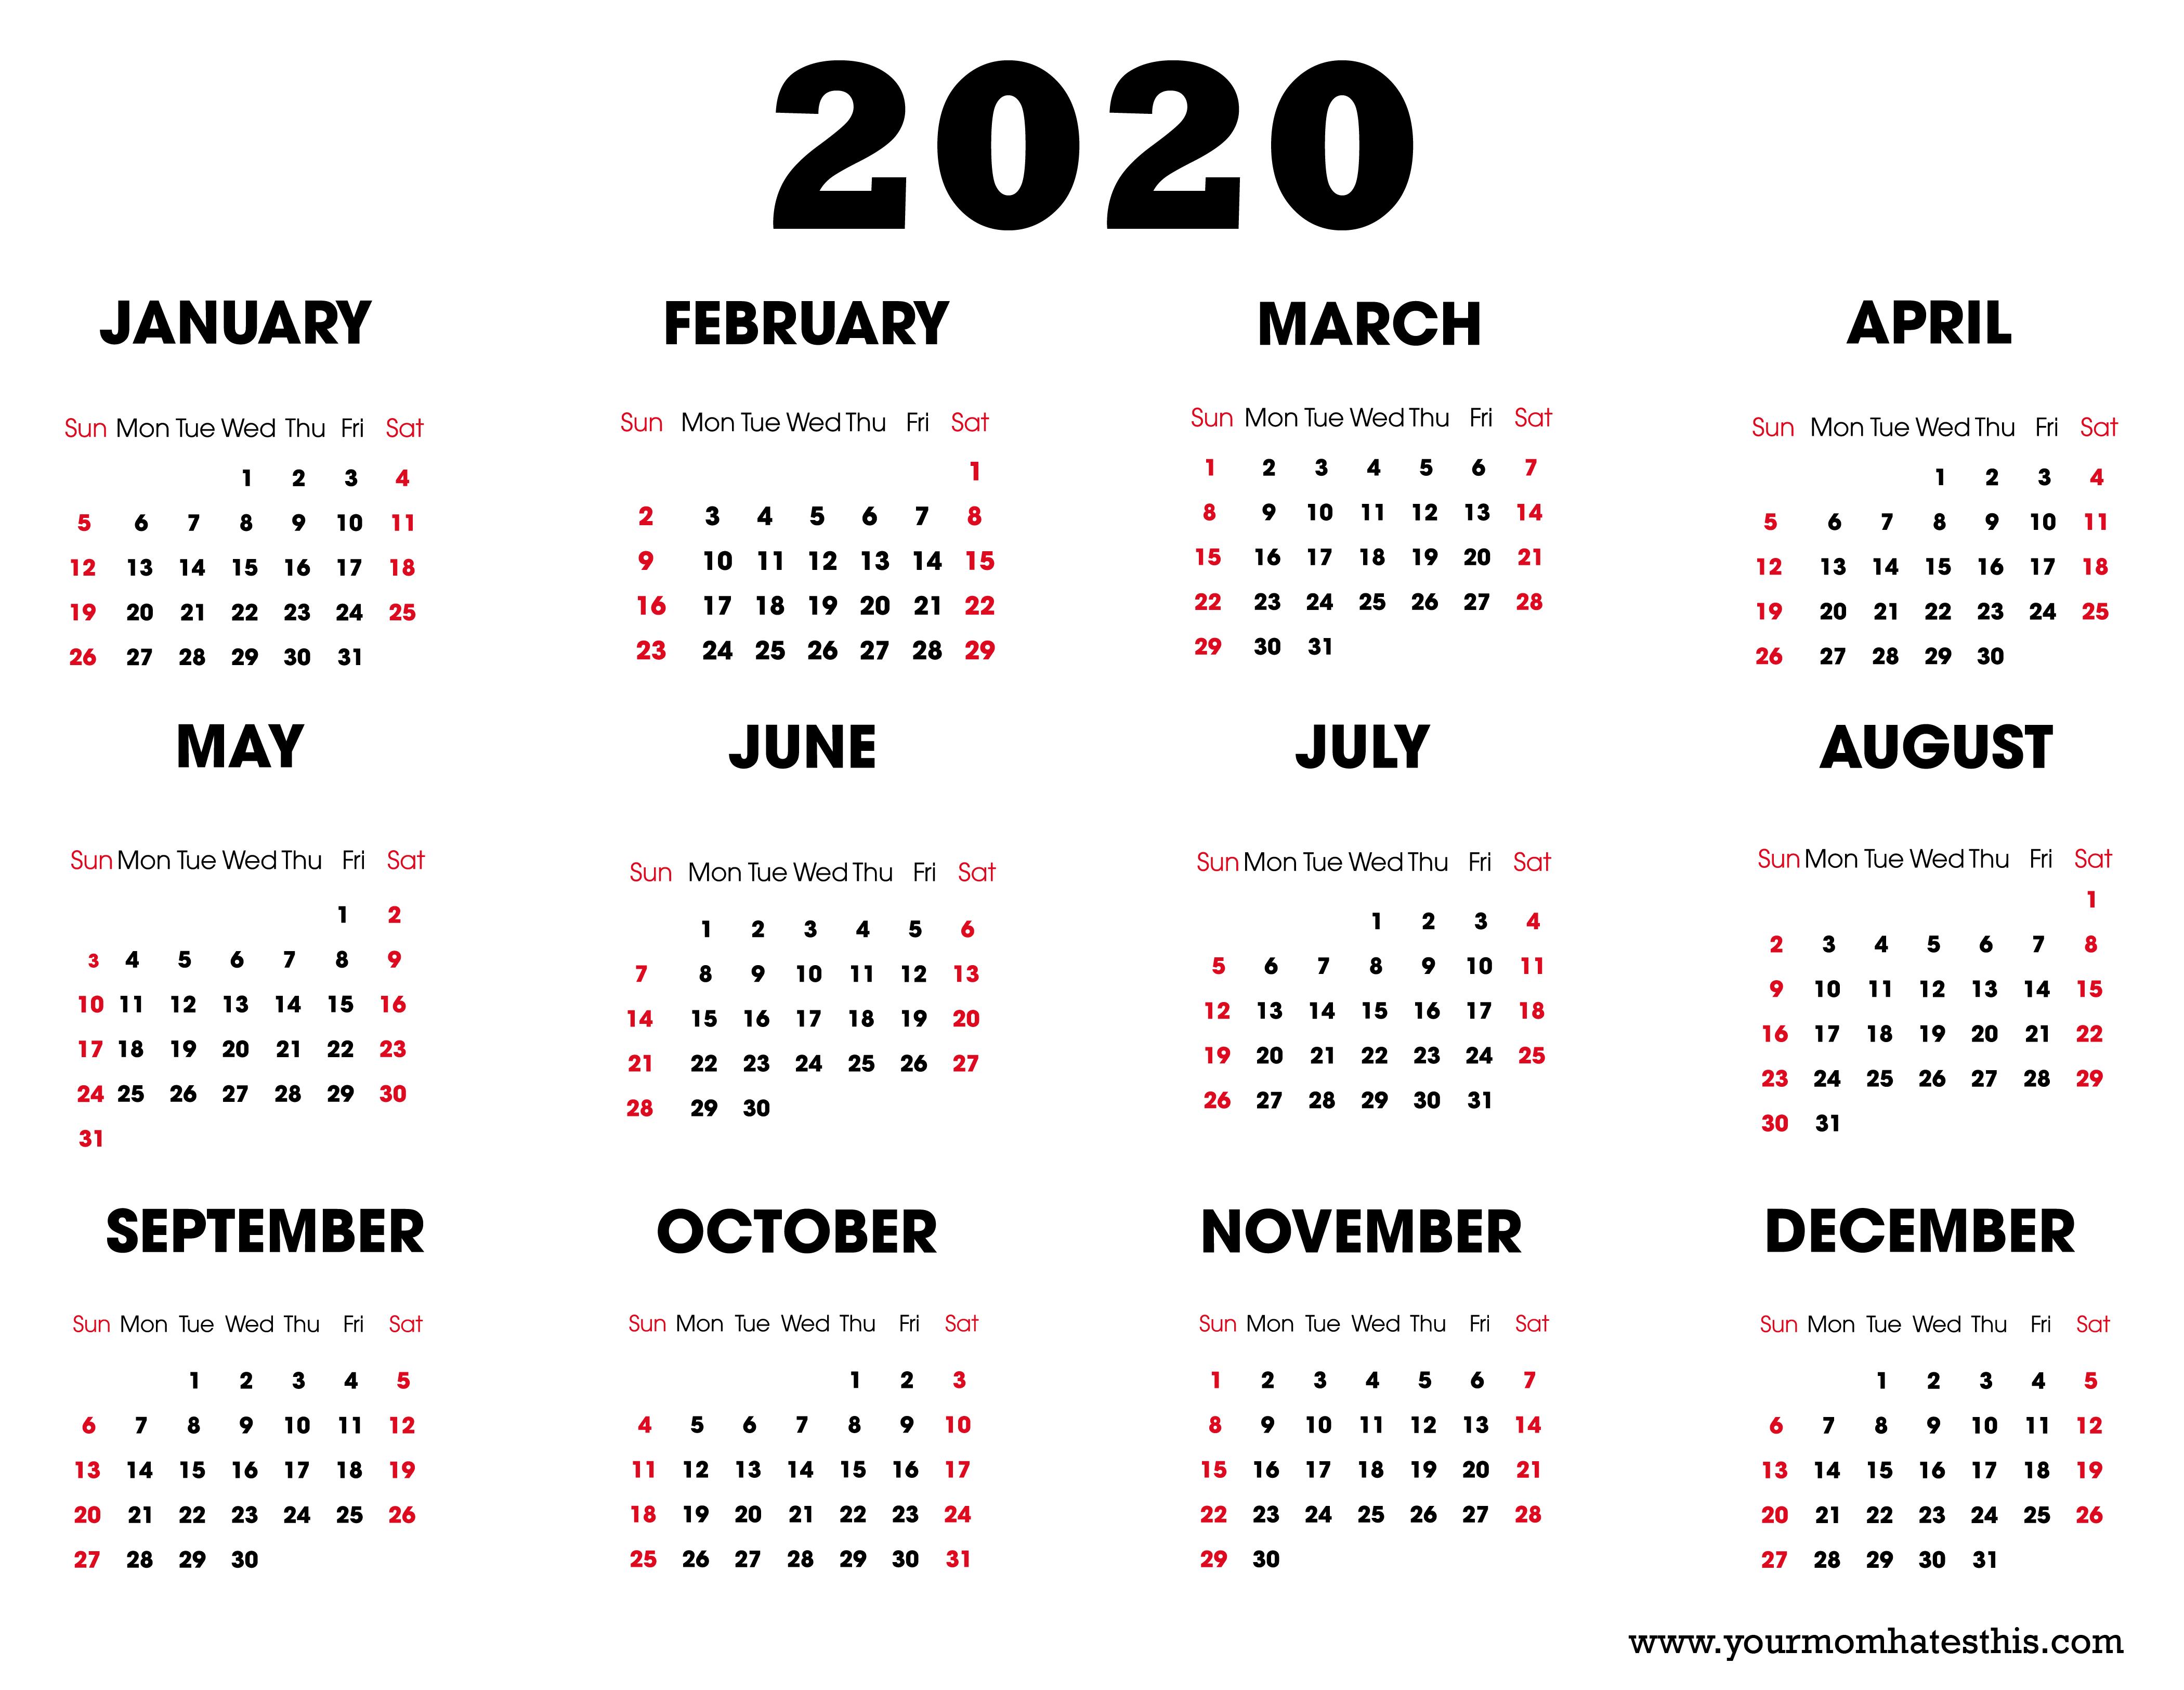 2020 Printable Calendar - Download Free Blank Templates - pertaining to 2020 Calendar Free Printable